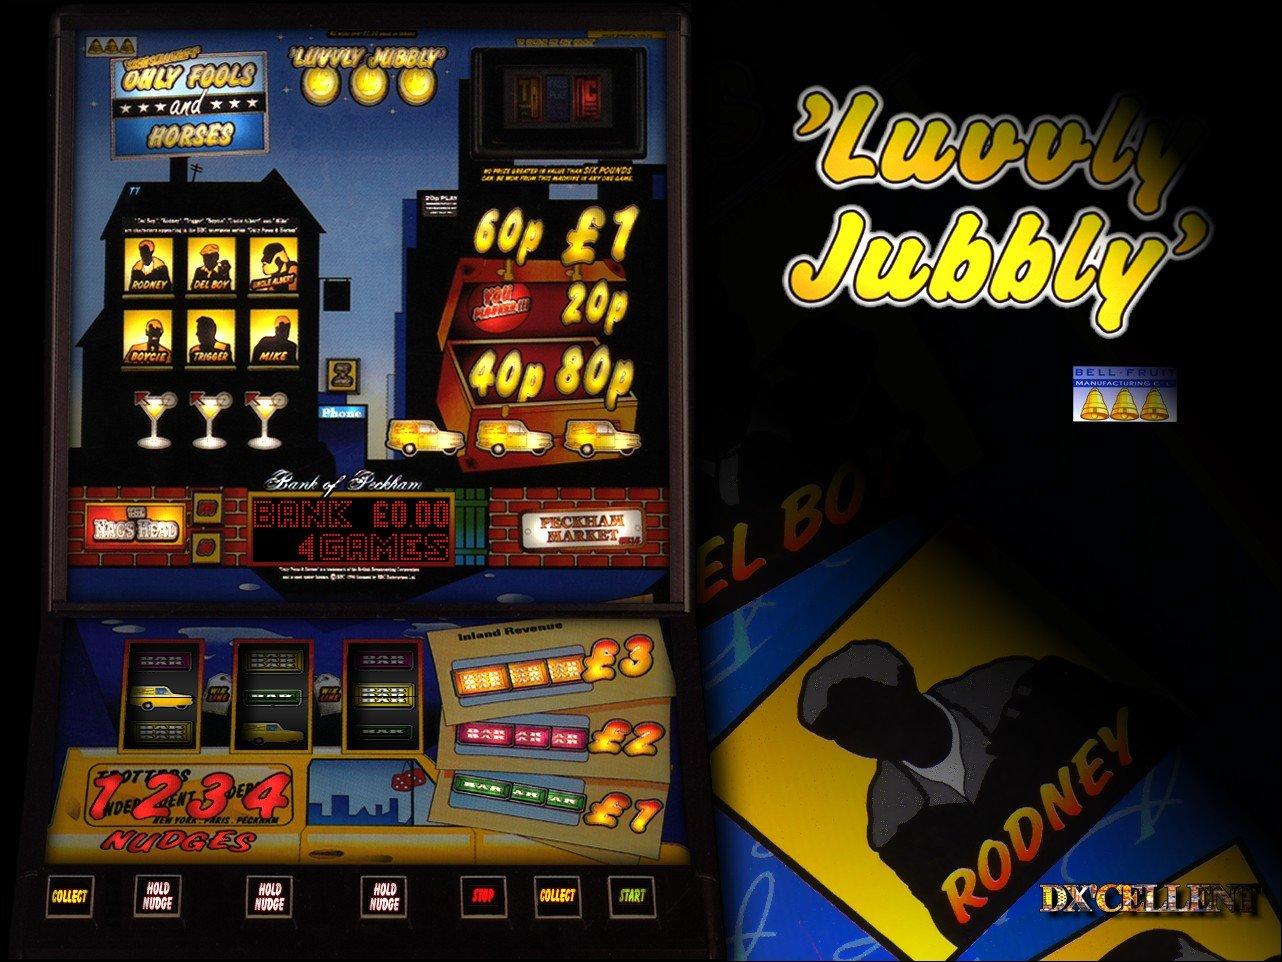 Luvvly Jubbly DX_1.jpg